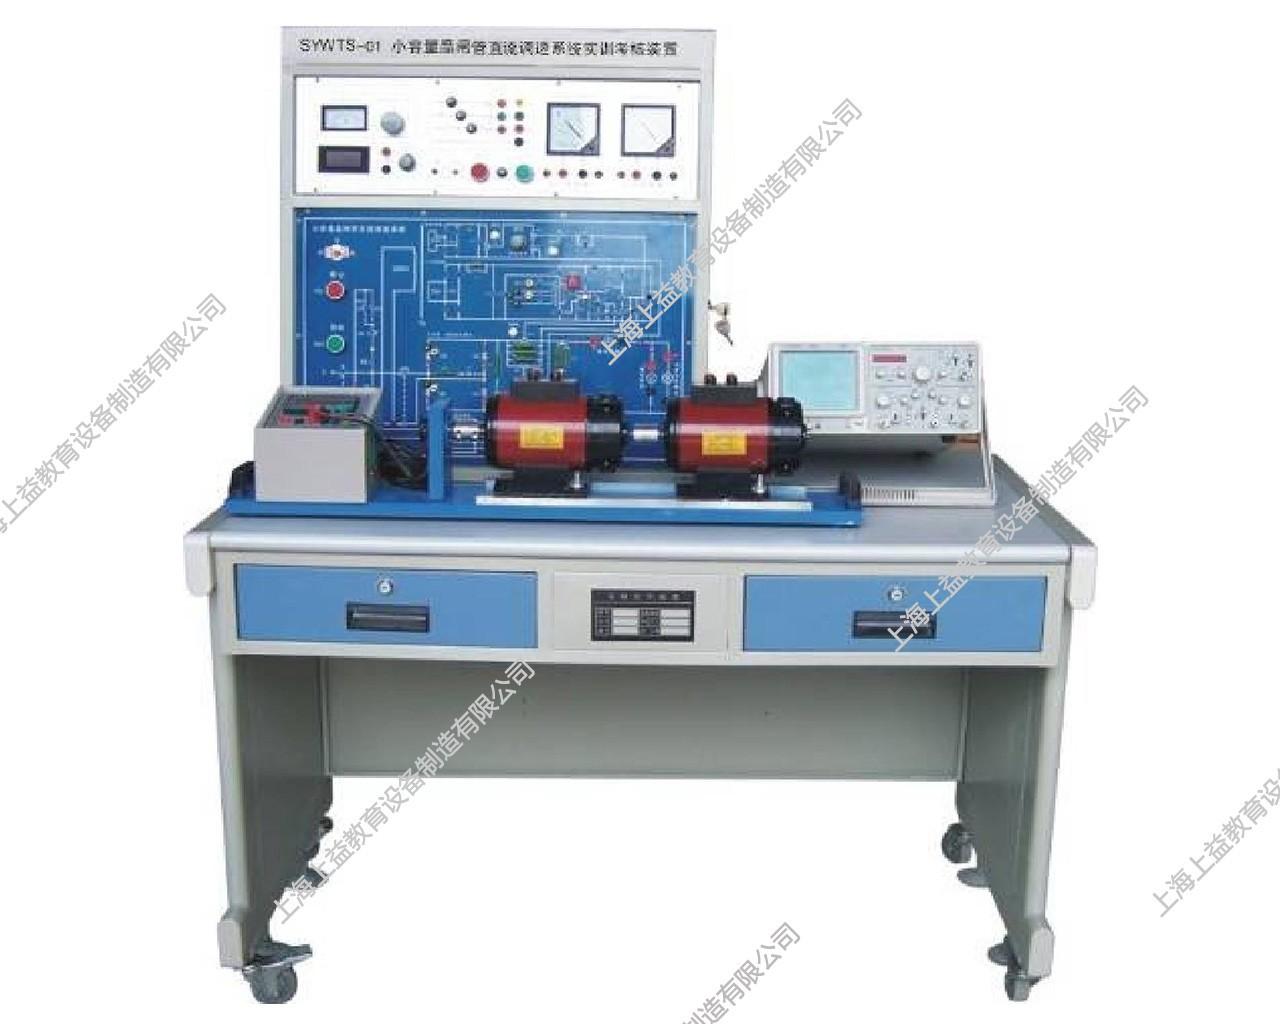 SYWTS-01小容量晶闸管直流调速系统wwwlehu8viplehu68vip装置